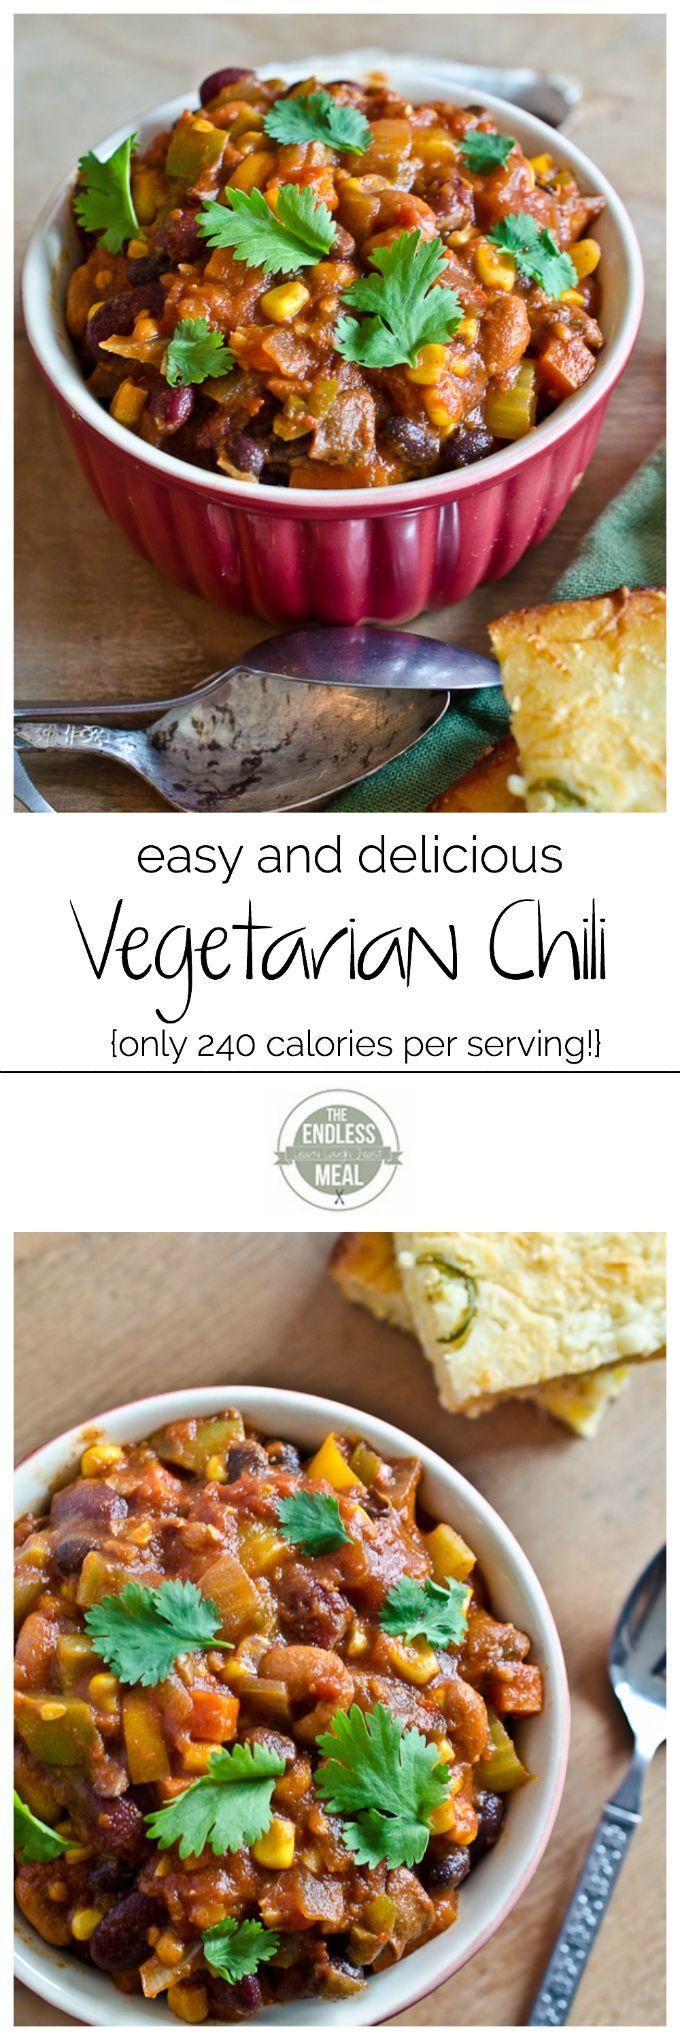 Easy Vegetarian Chili Recipe | theendlessmeal.com